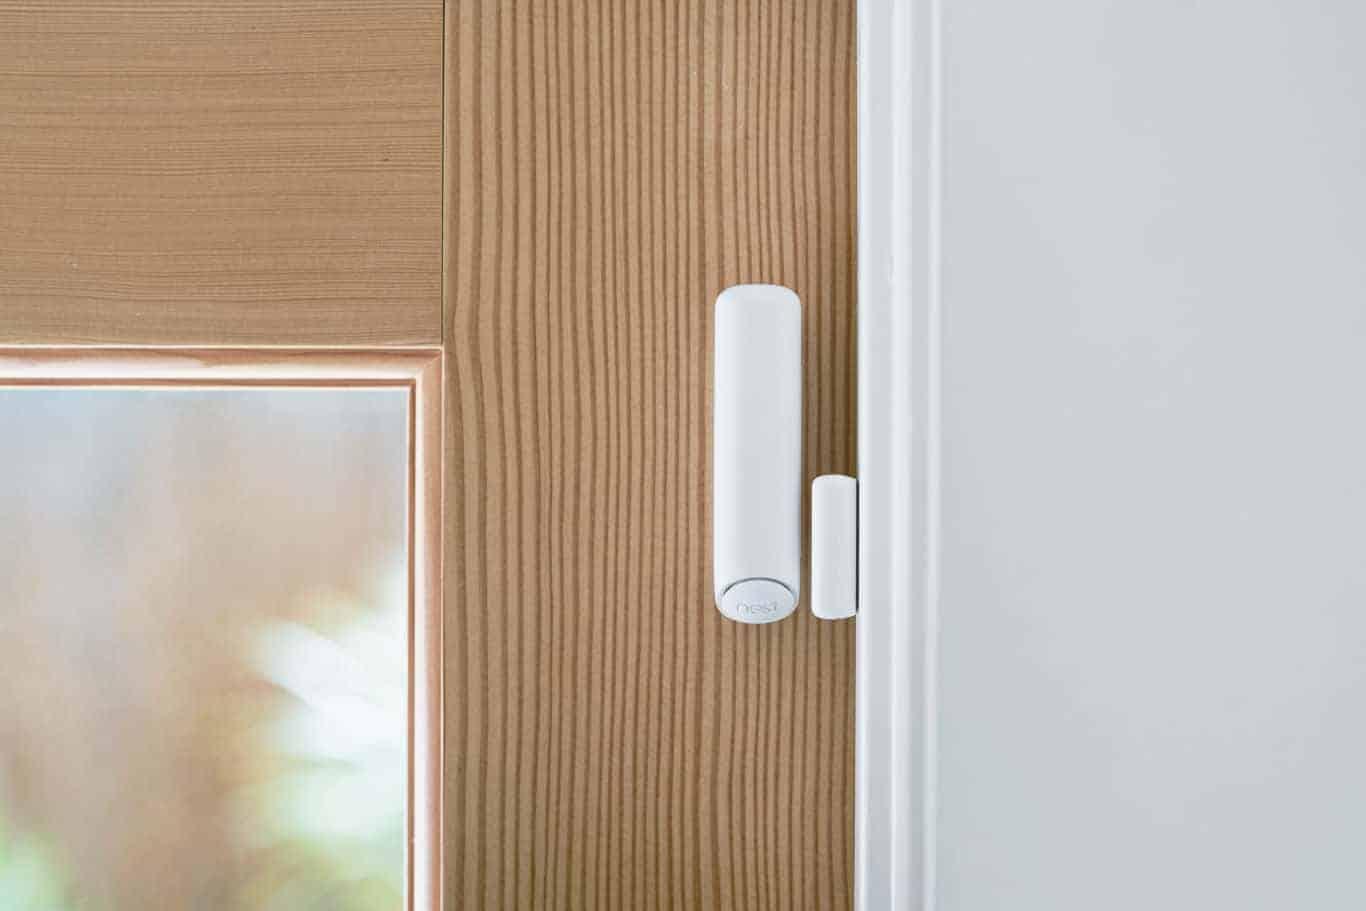 Nest Secure Connect Detect 2